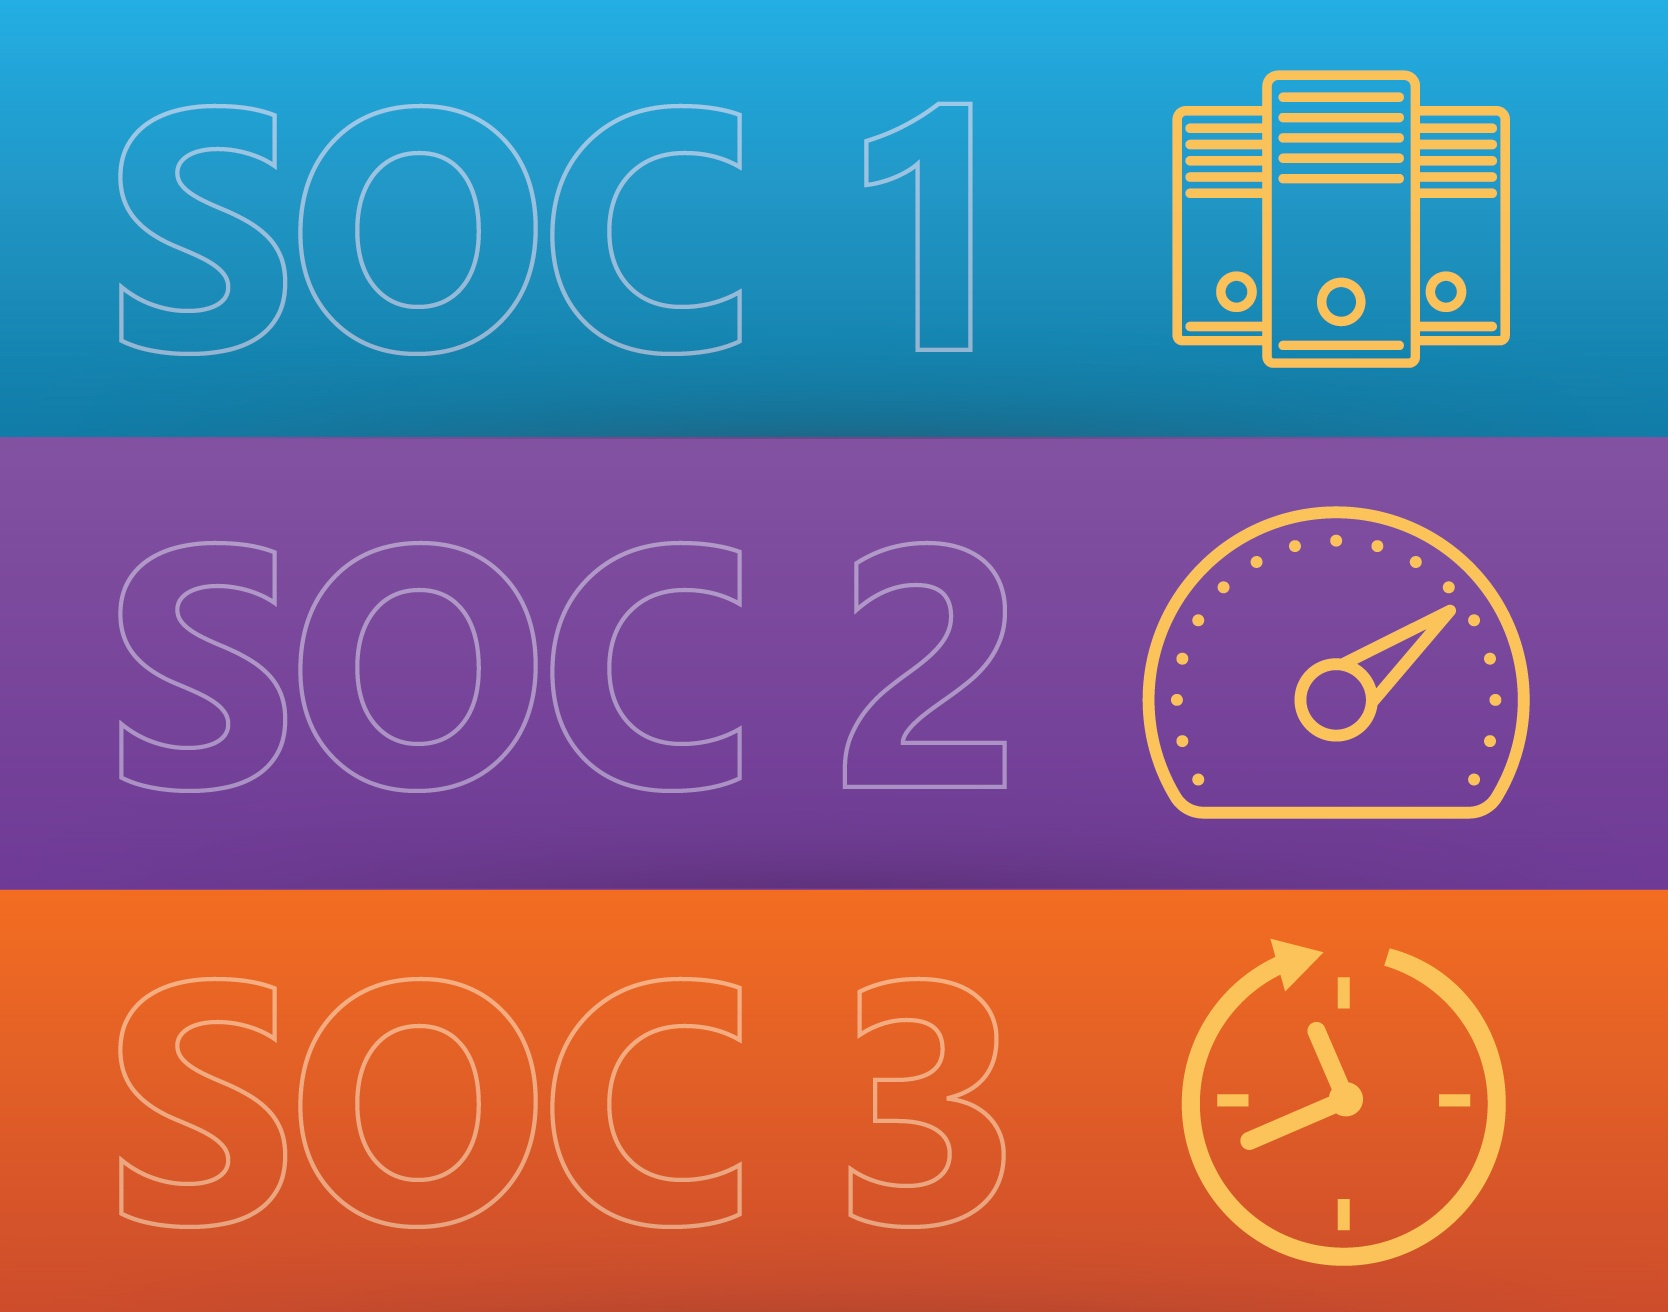 soc 1 soc 2 soc 3 differences